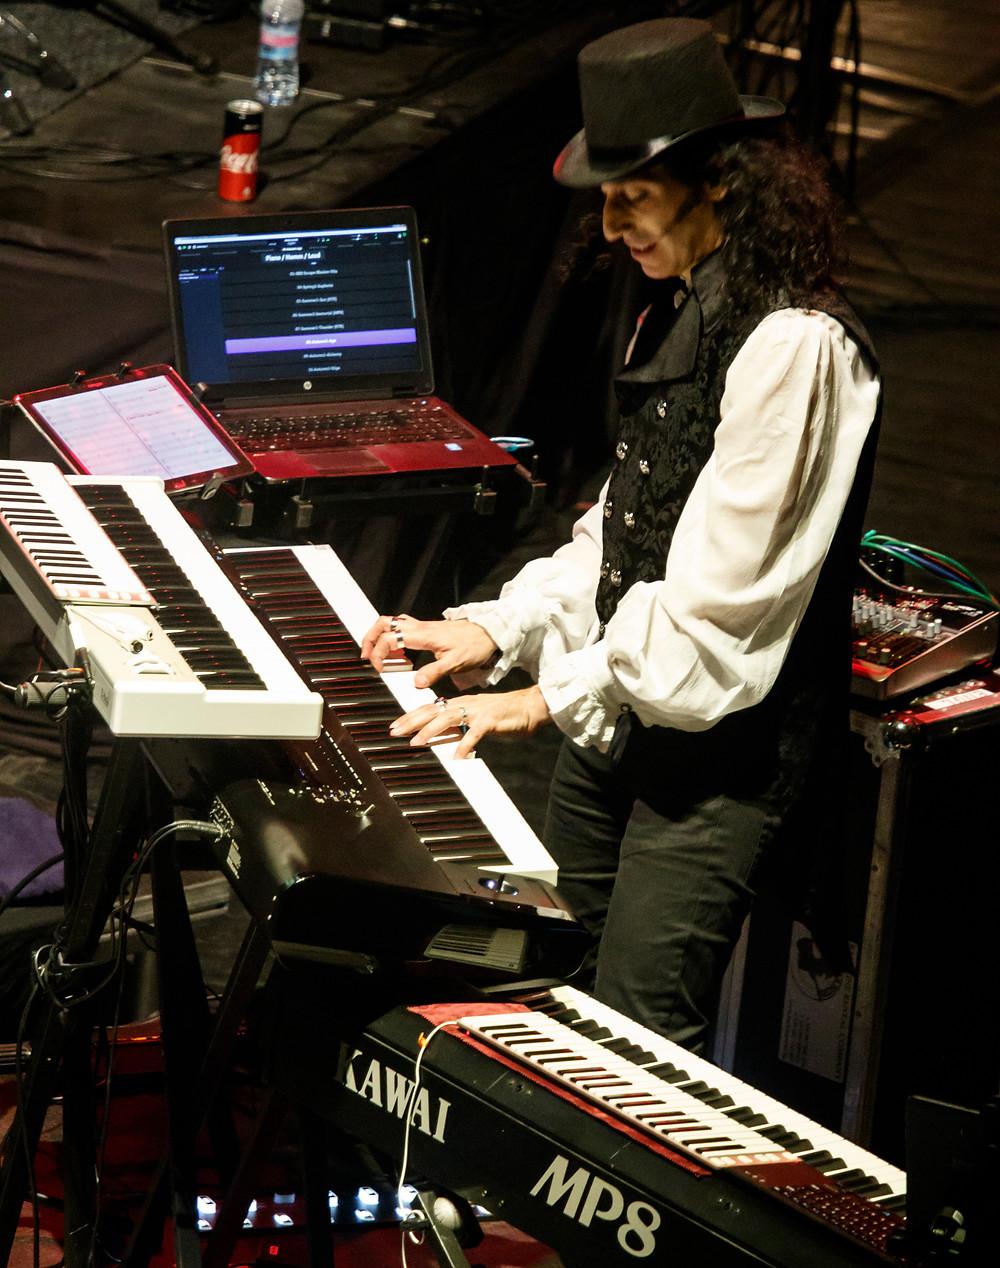 Mistheria live on keyboards in Plovdiv, Bulgaria